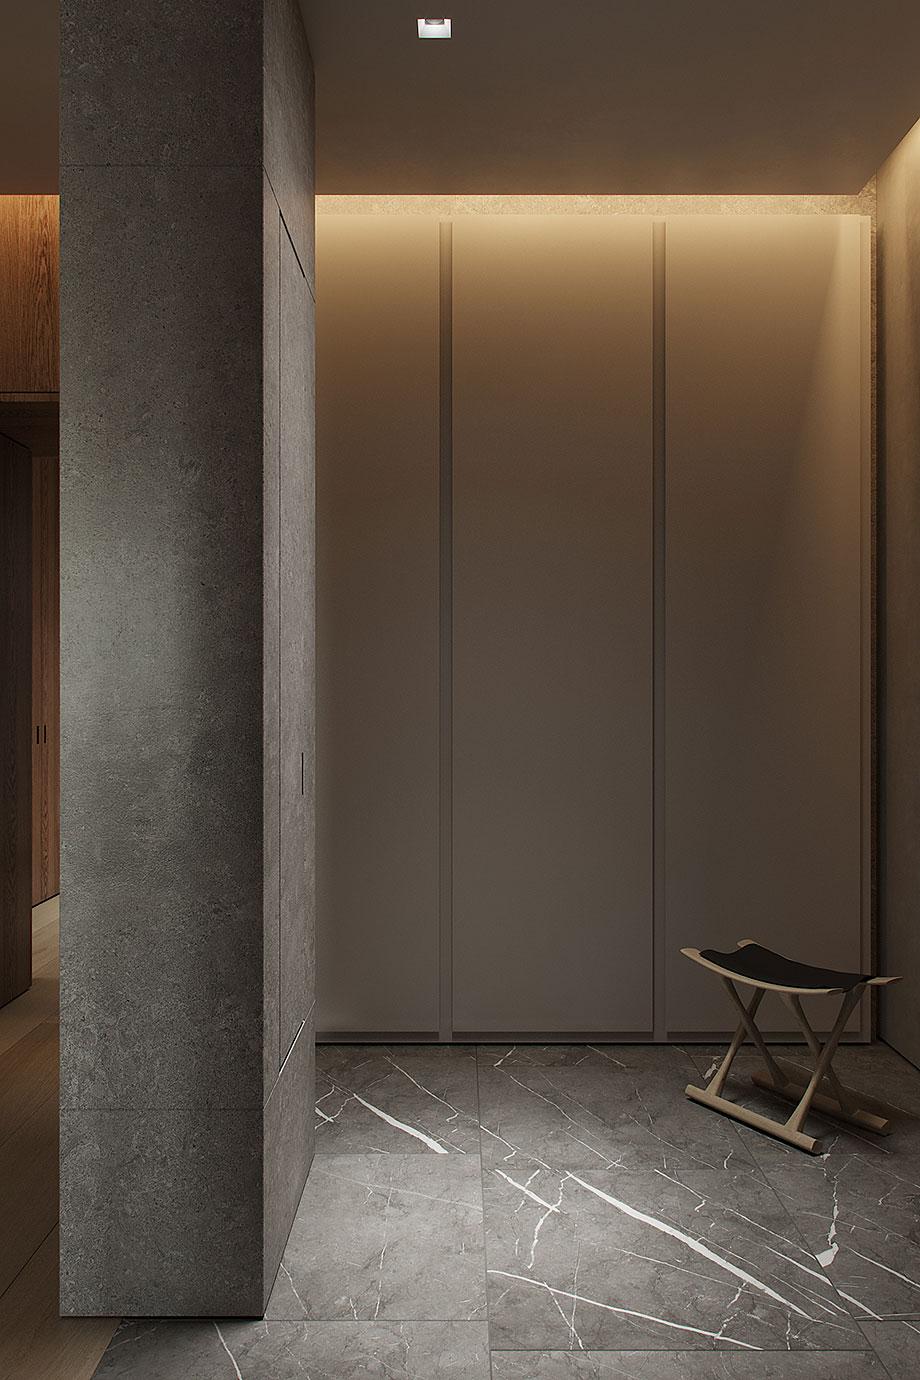 apartamento en moscu de kodd bureau (10) - foto daria koloskova